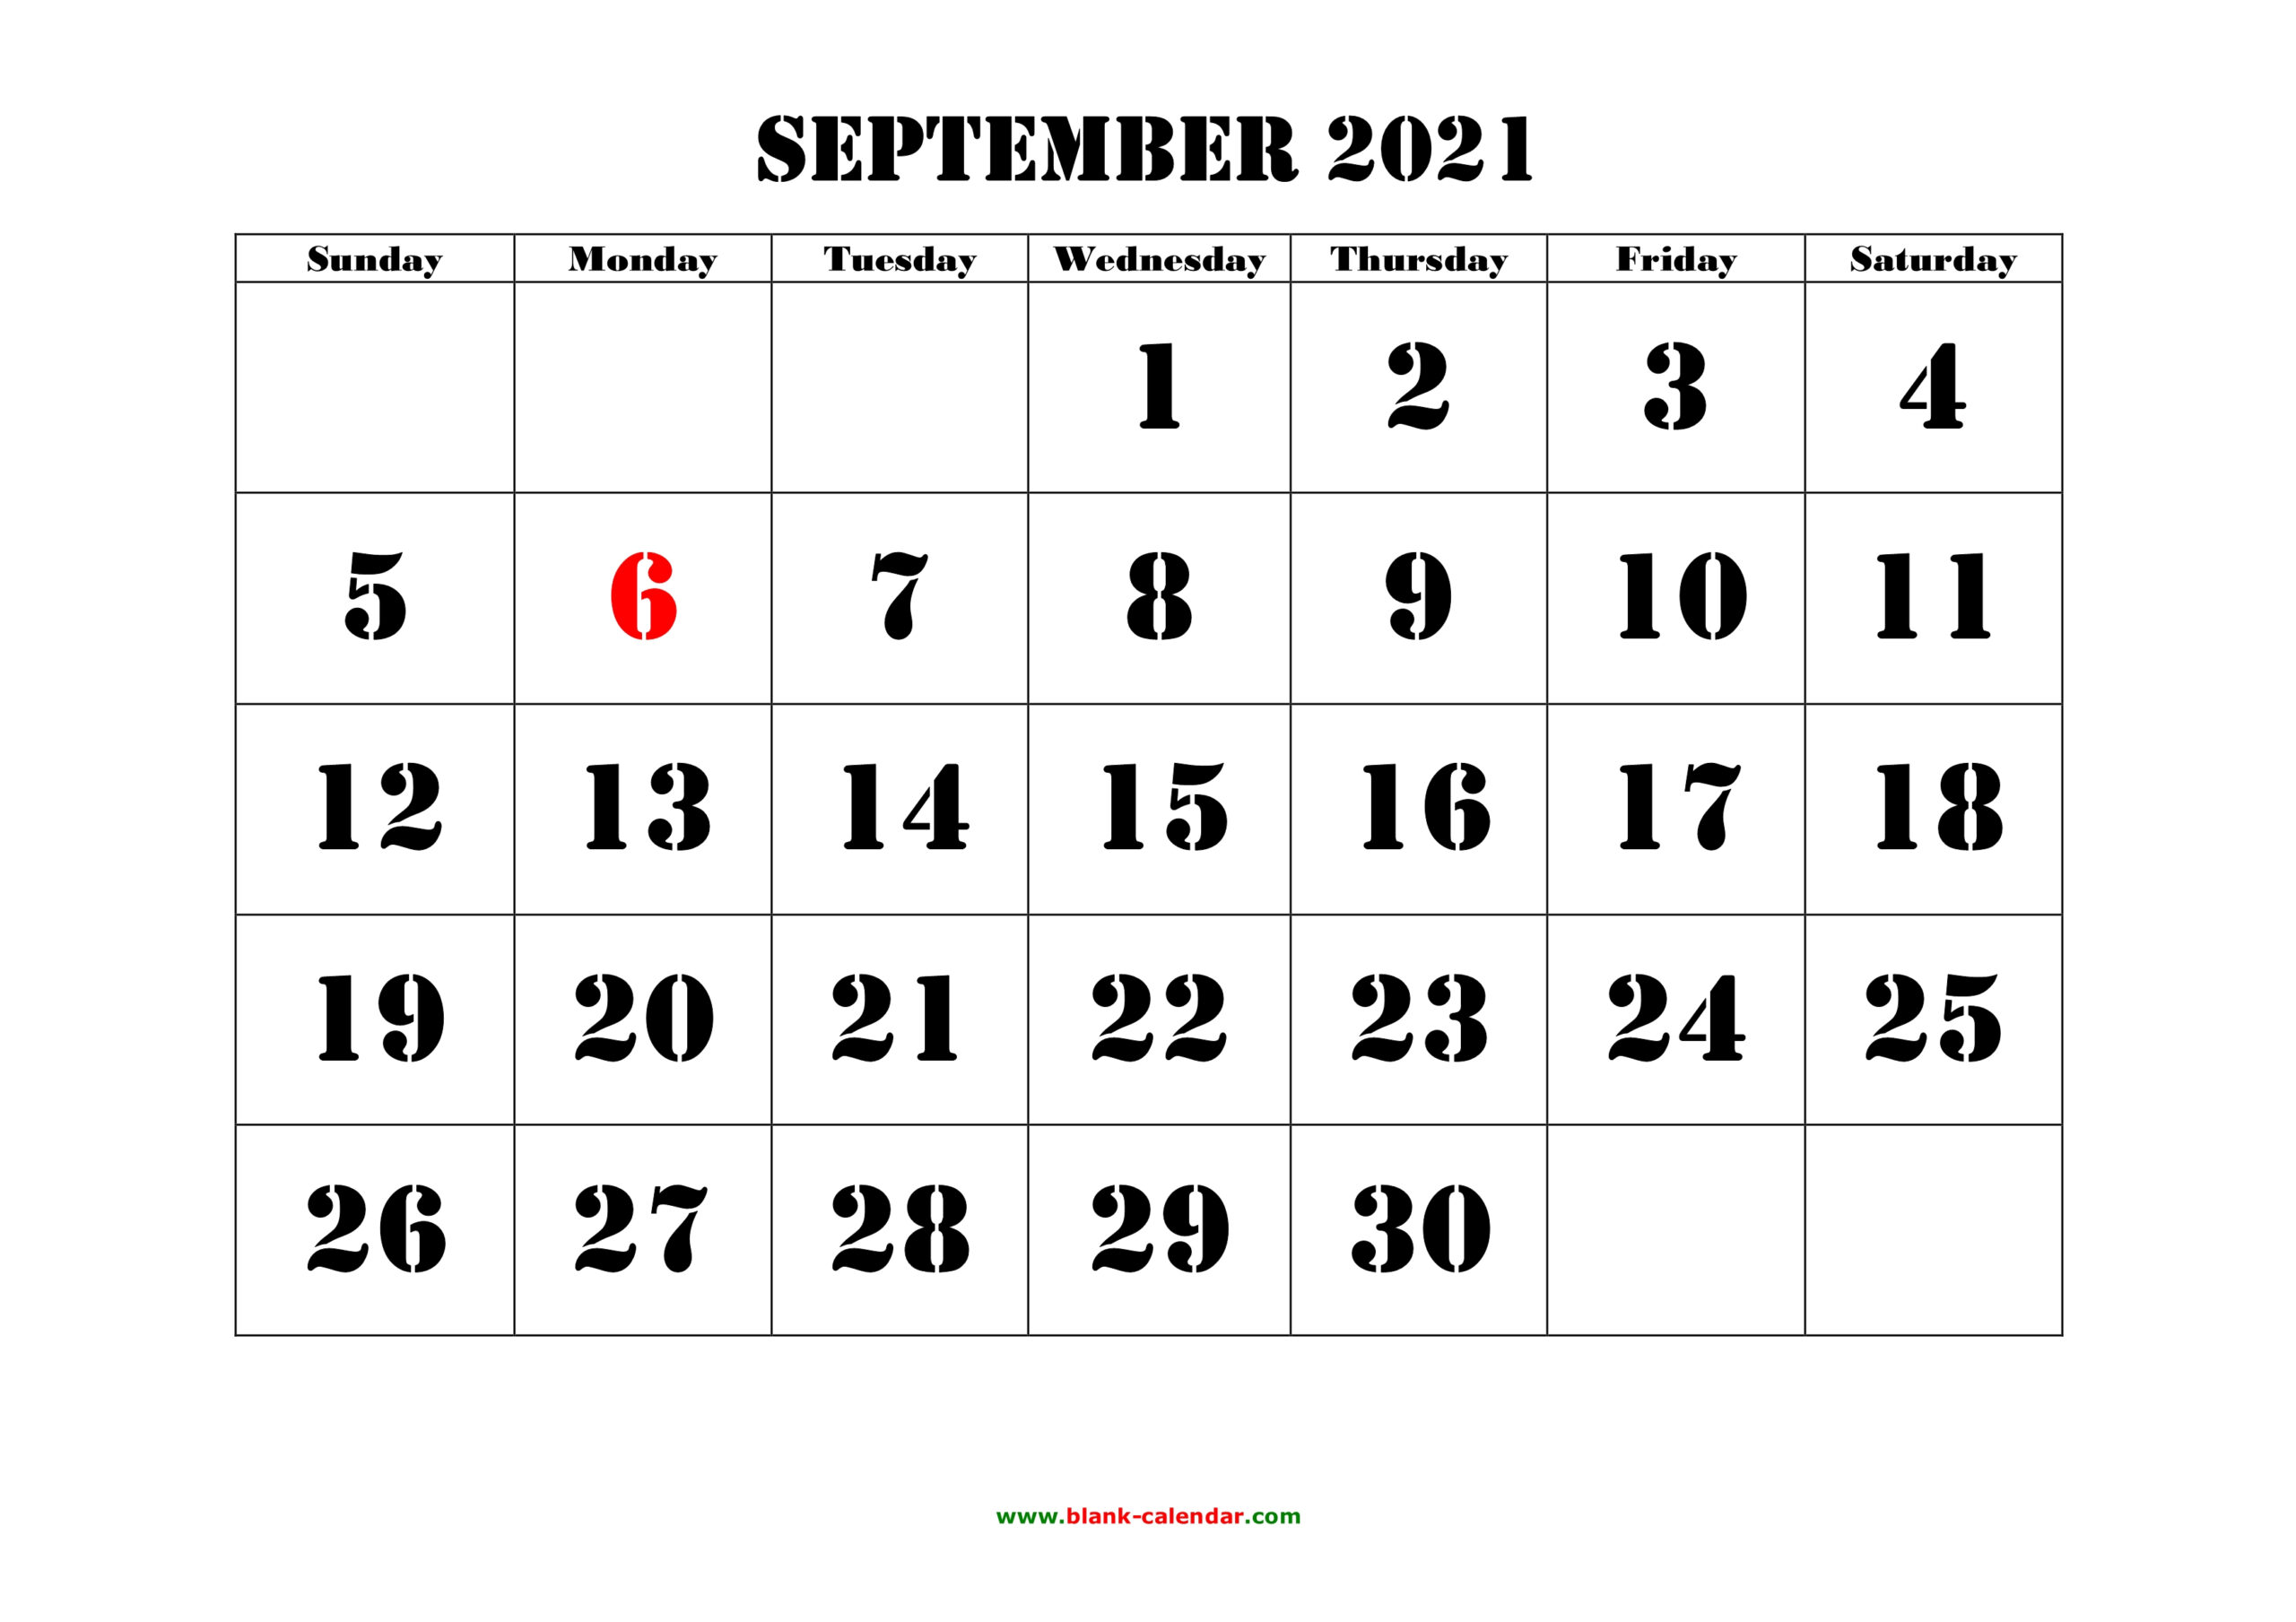 September 2021 Printable Calendar | Free Download Monthly regarding September 2021 Calendar Printable